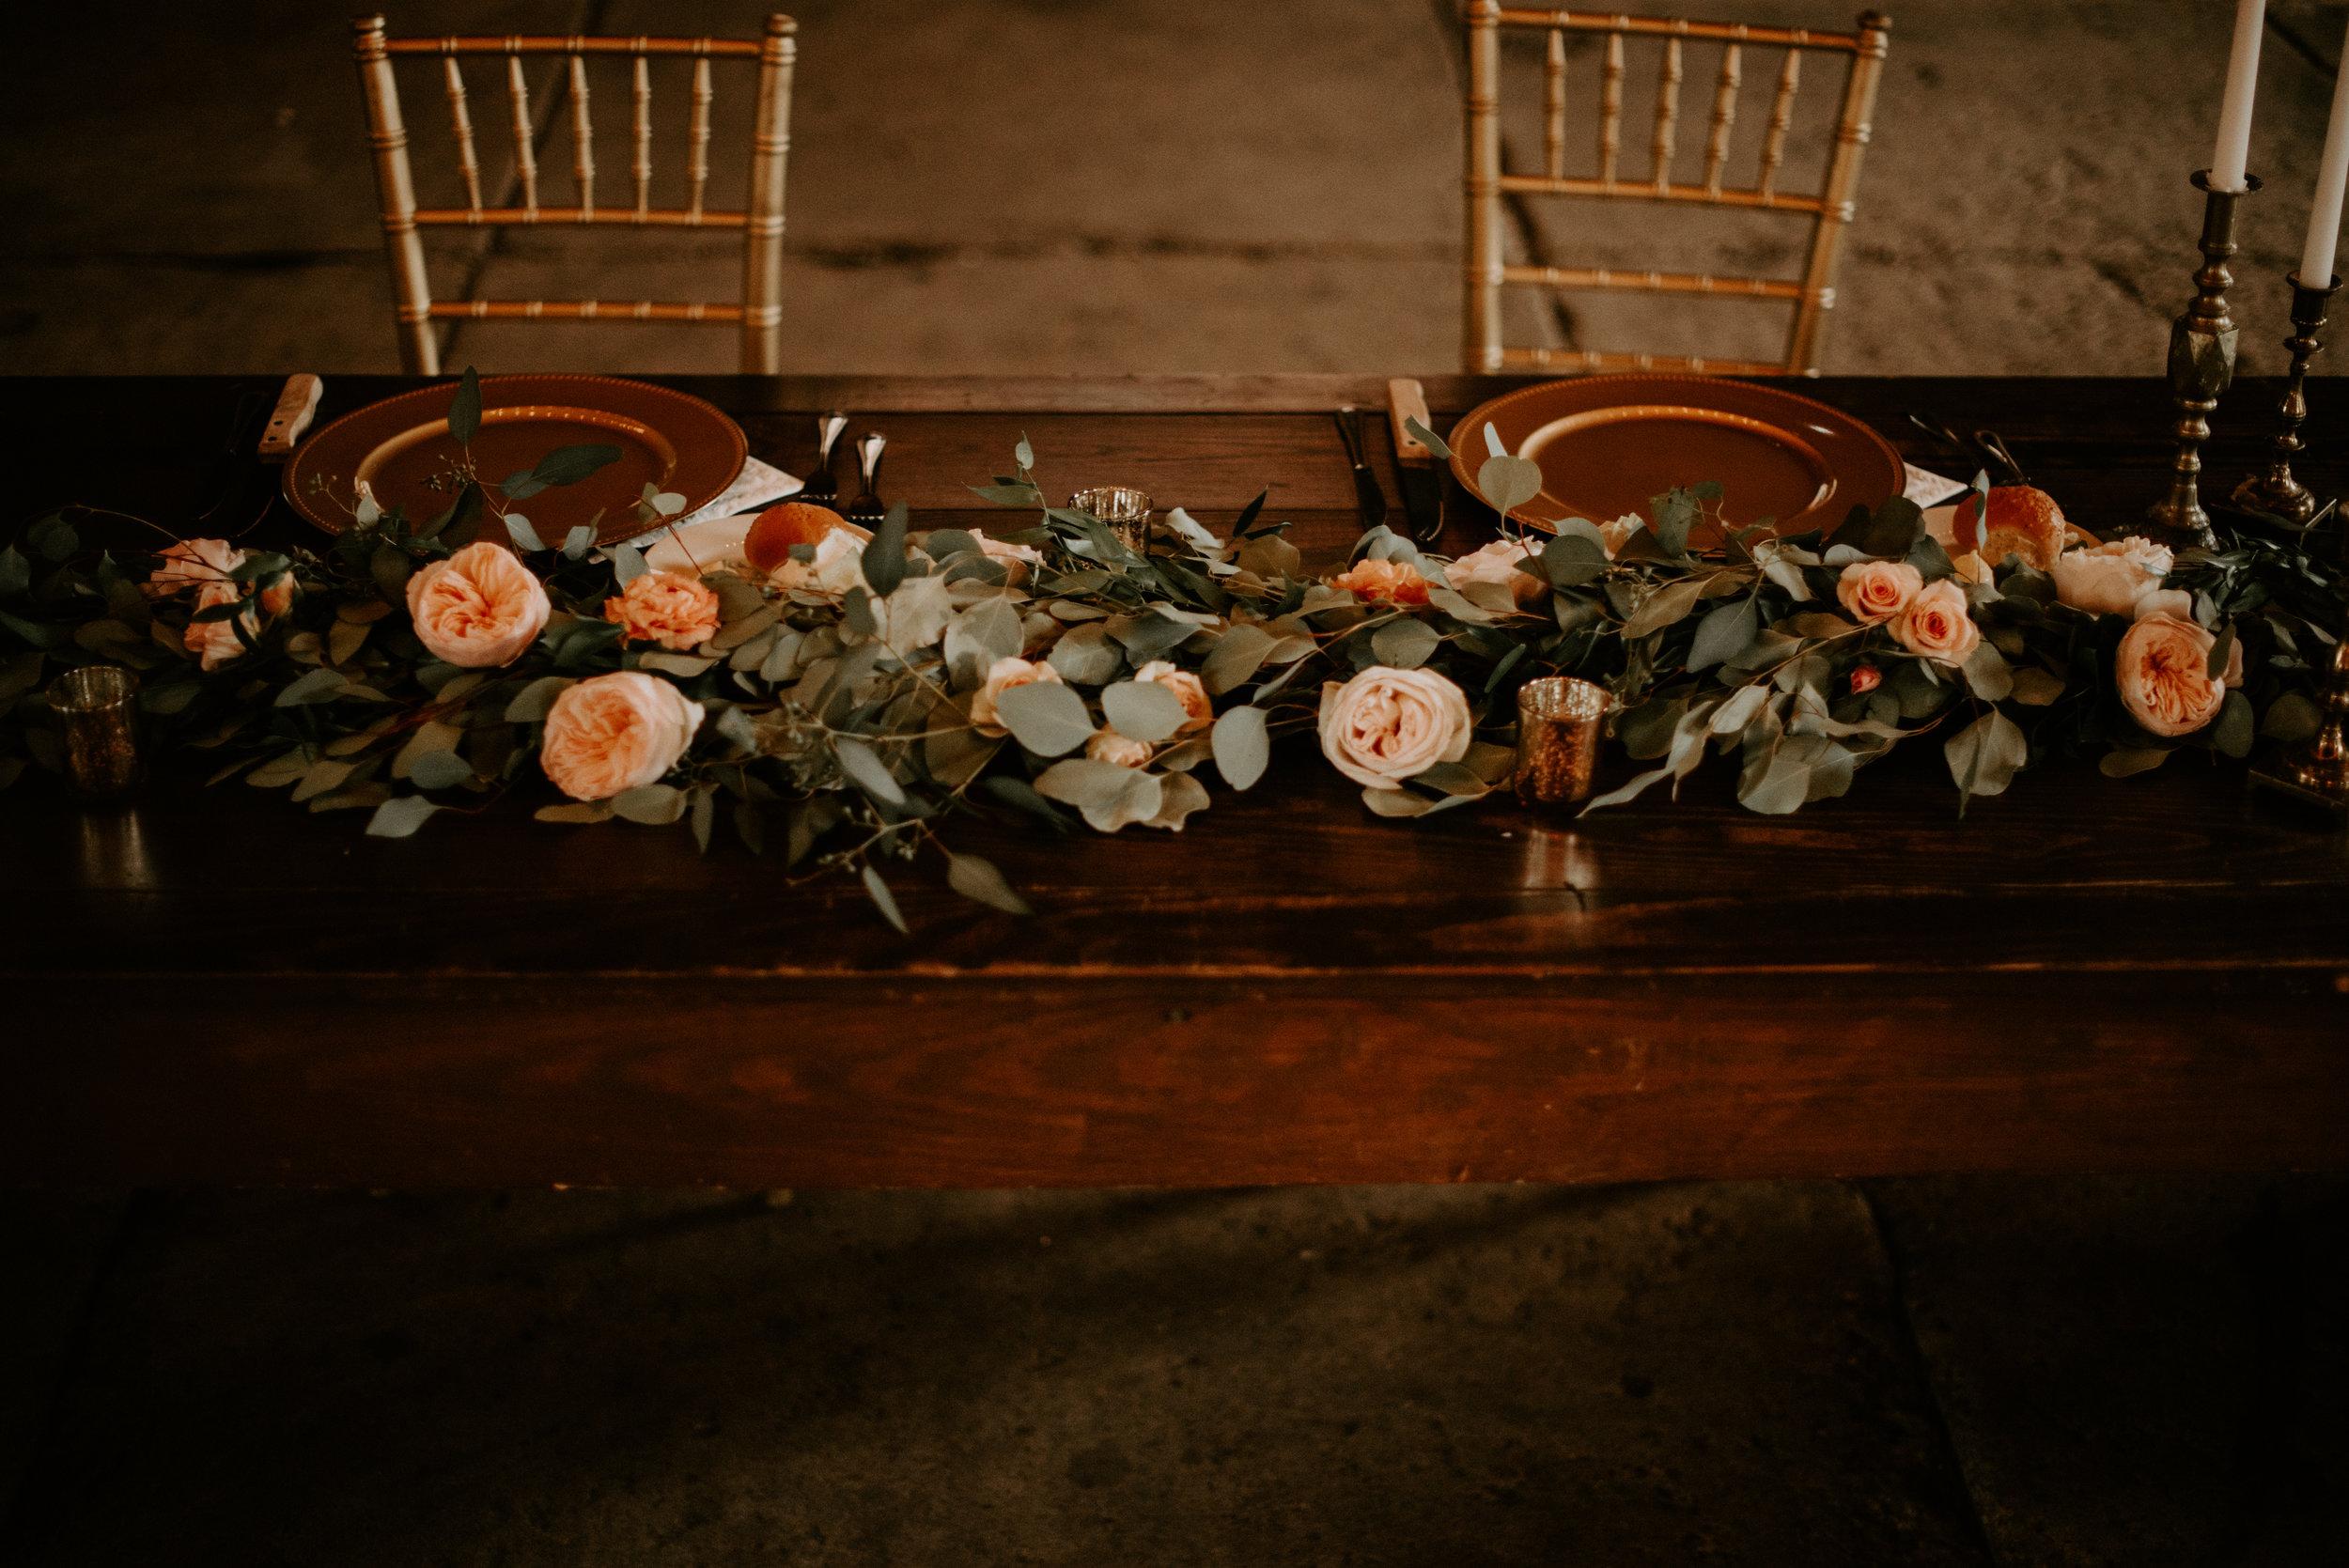 savannah-bridal-shop-andrea-and-mike-evergold-photography-georgia-state-railroad-museum-wedding-savannah-wedding-florist-savannah-wedding-planner-52.jpg